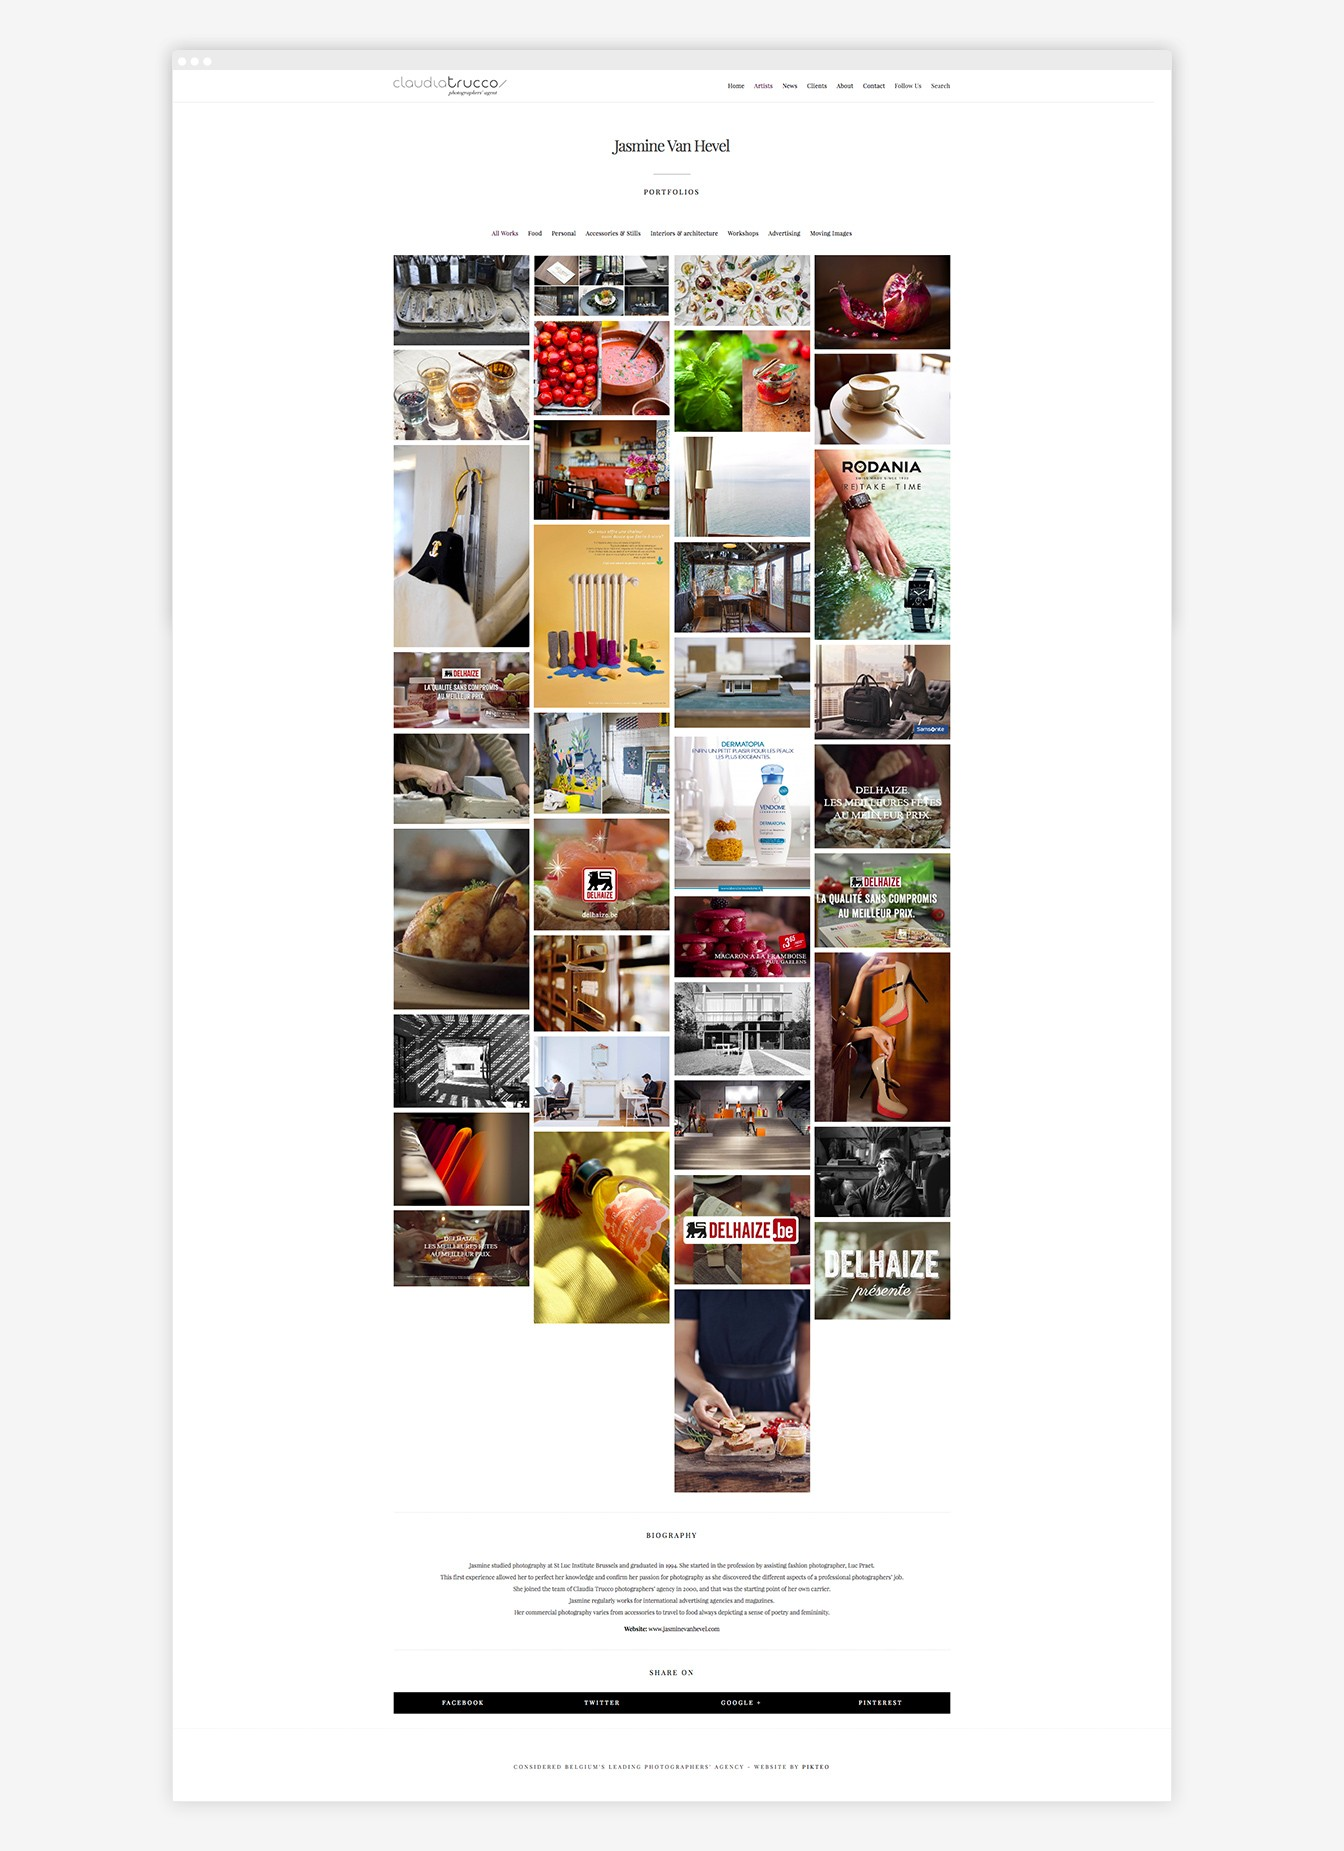 01-claudia-trucco-web-pikteo-webdesign-graphic-design-freelance-paris-bruxelles-lyon